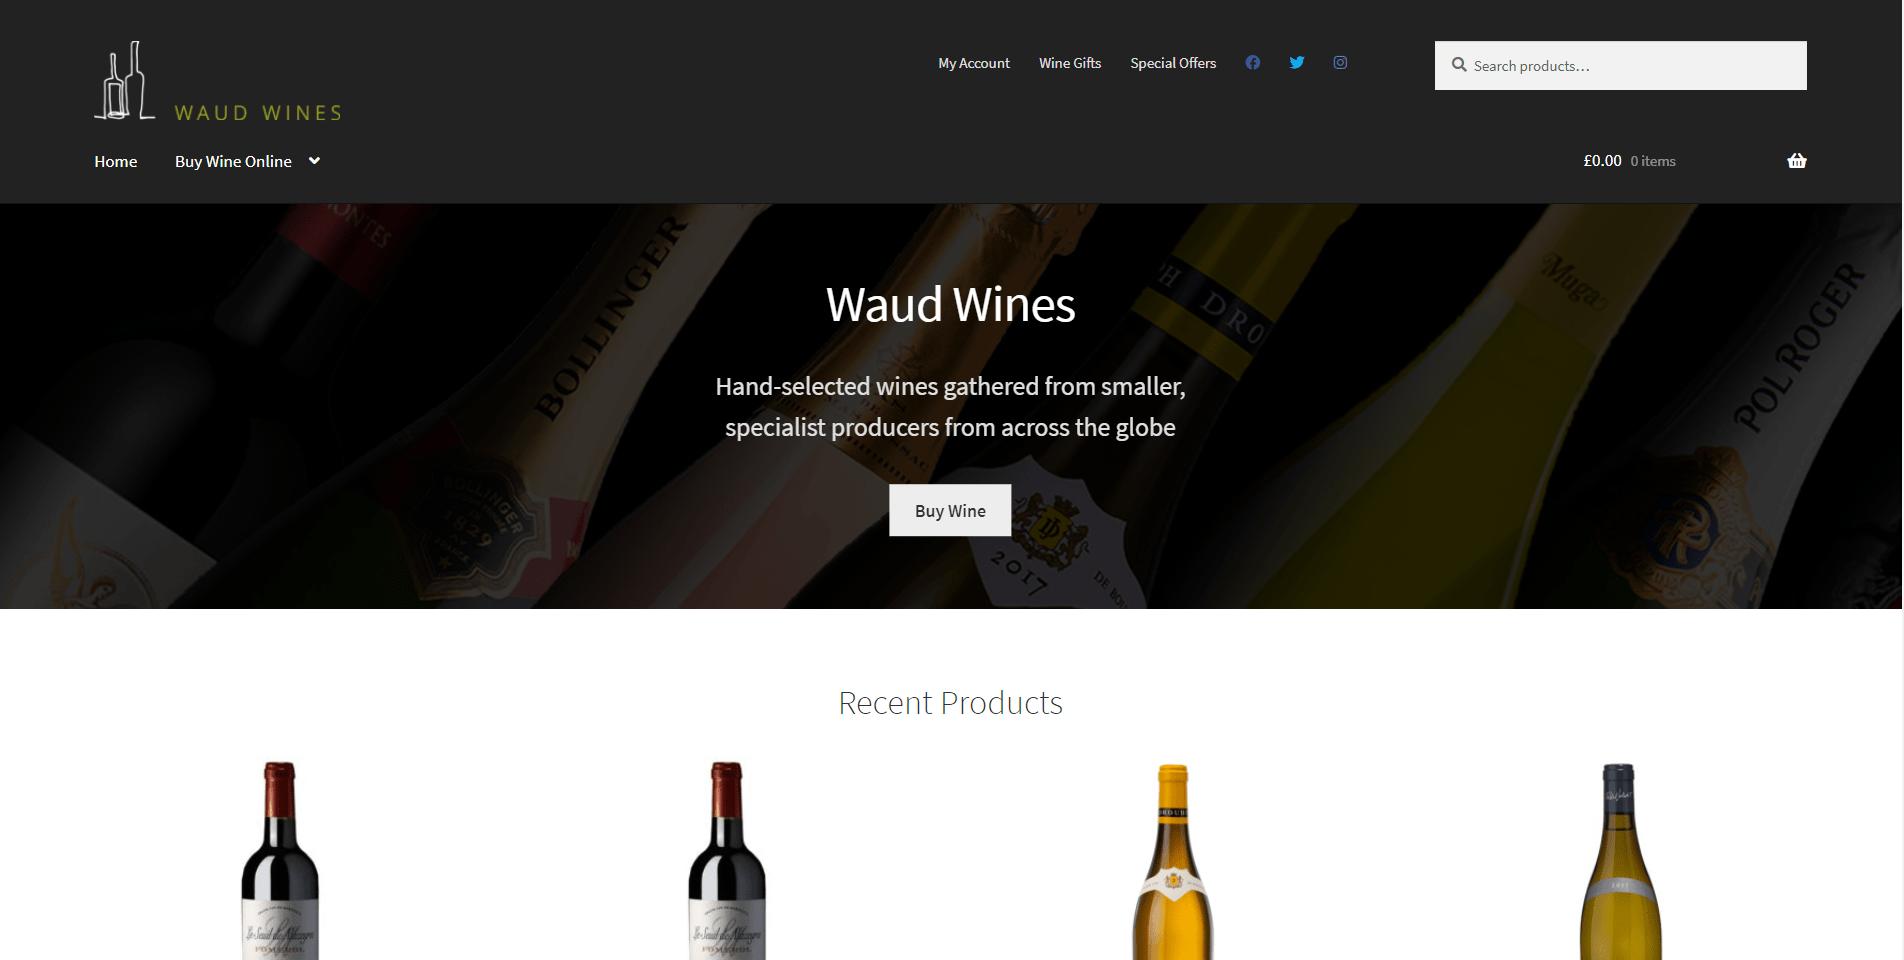 New Waud Wines website